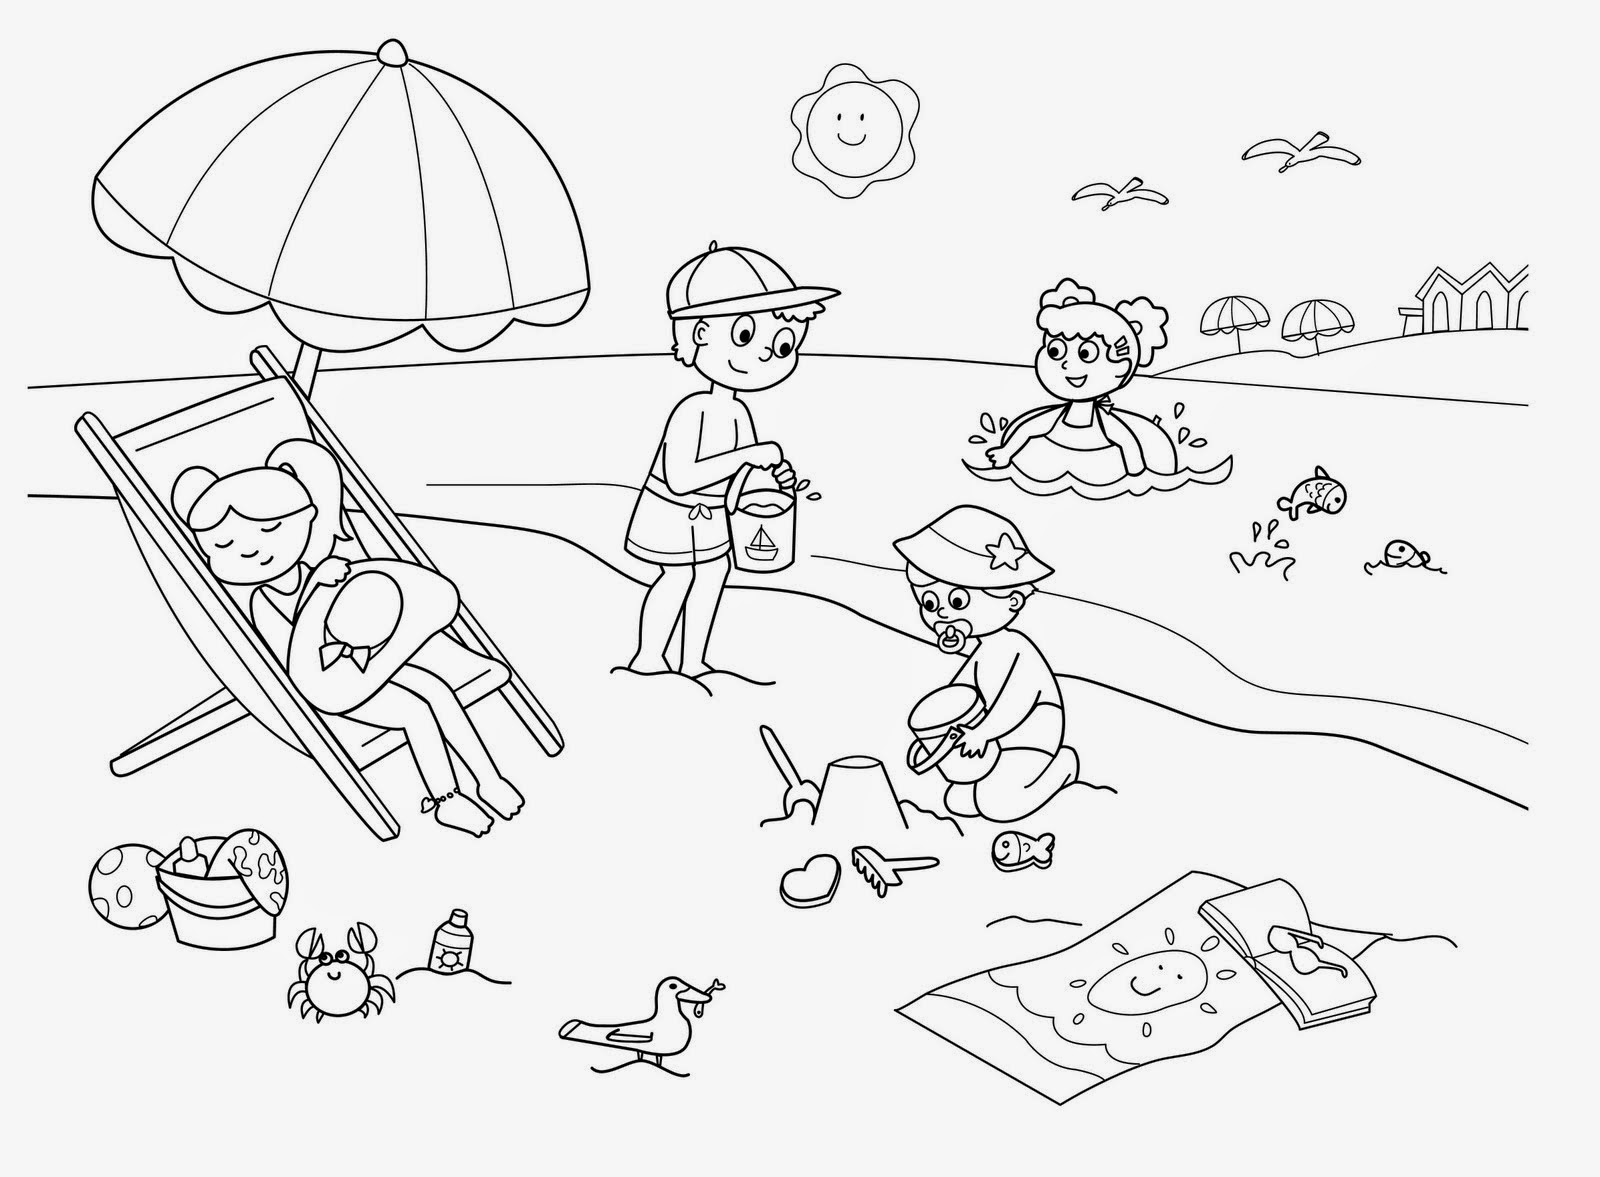 seaside coloring pages - desenhos de f rias para pintar colorir imprimir